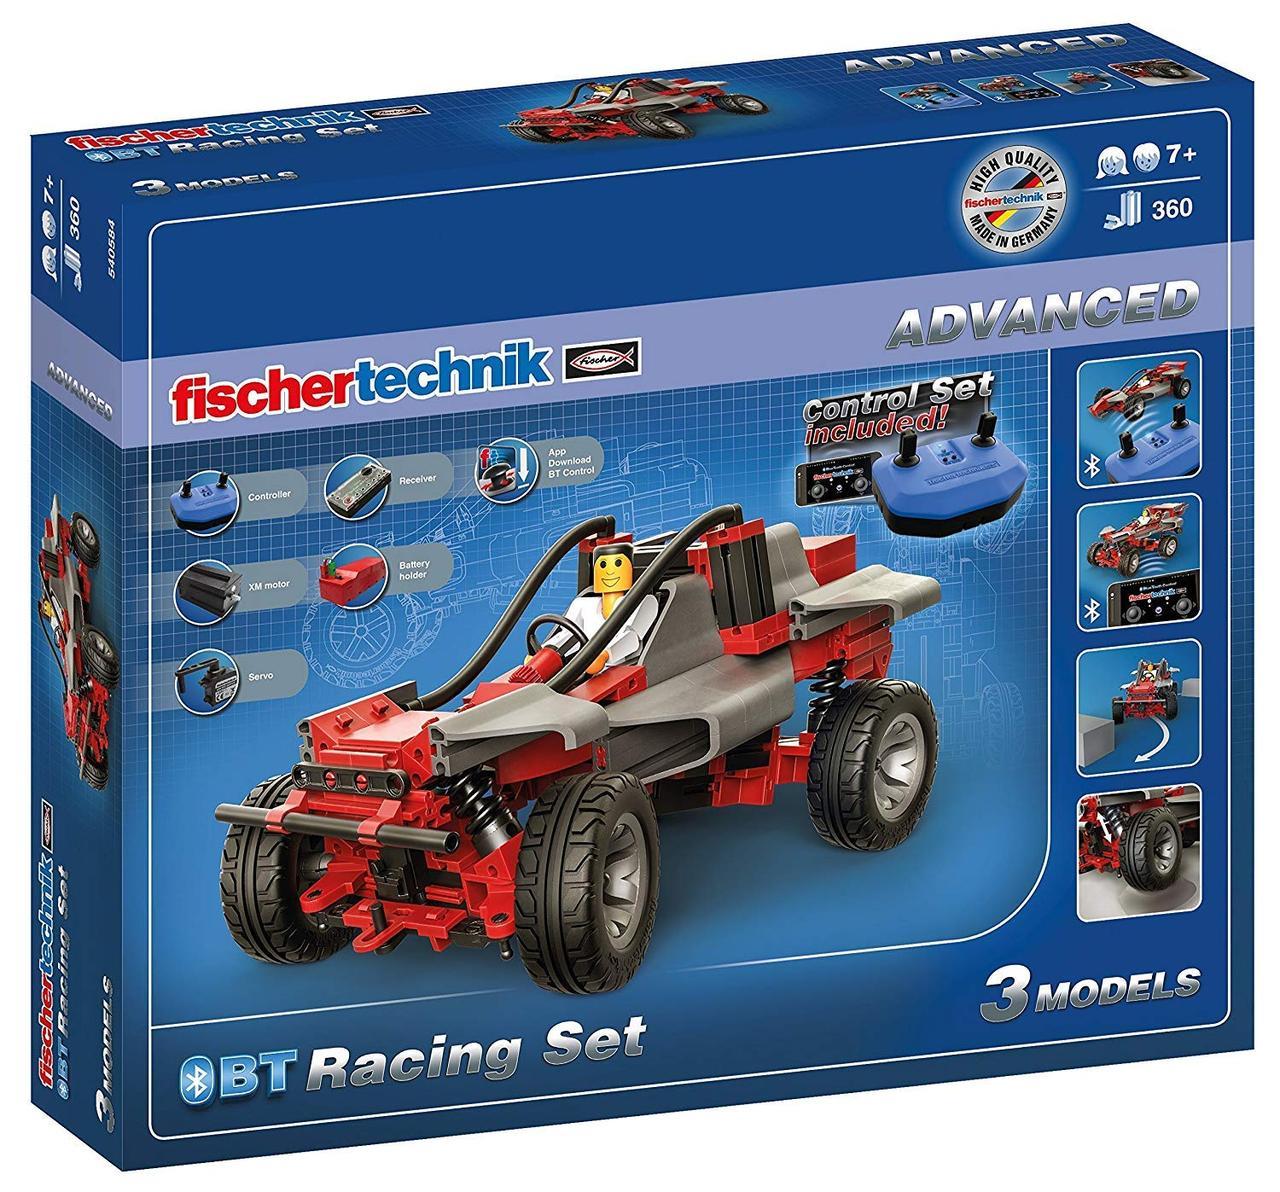 Ігровий набір Fischer Technik 540584 BT Racing Set